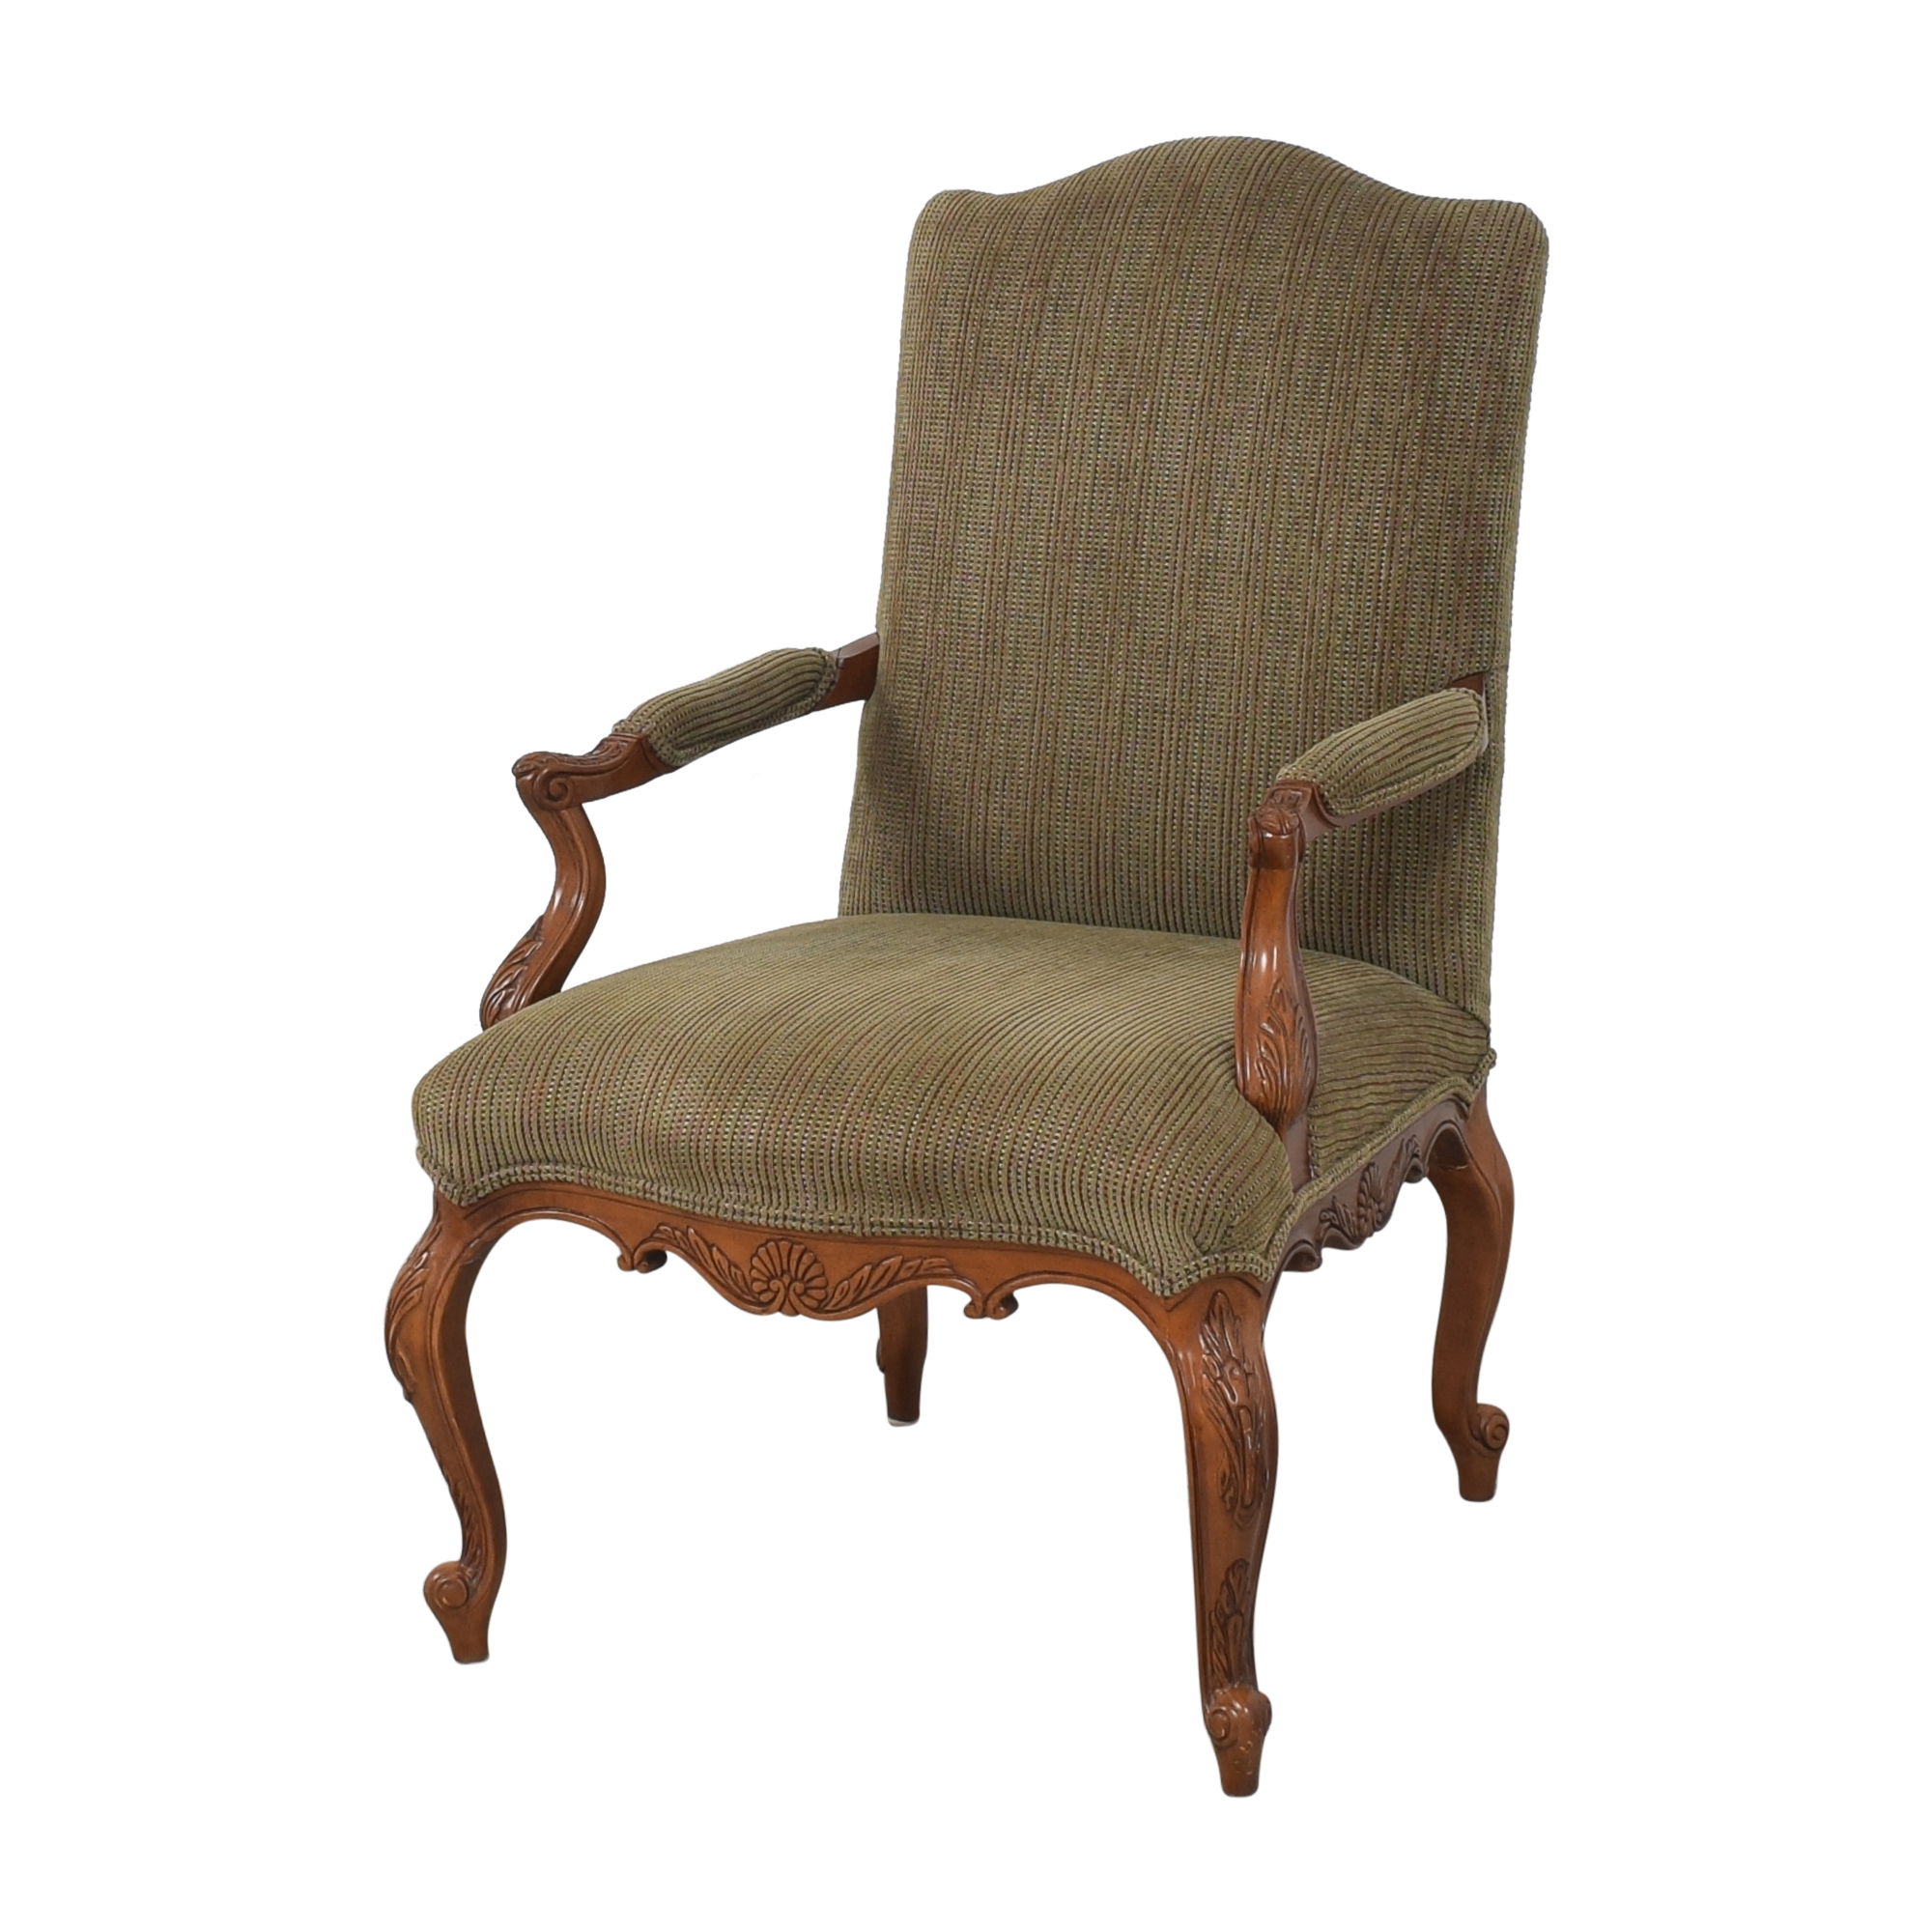 Drexel Heritage Drexel Heritage Accent Chair nj